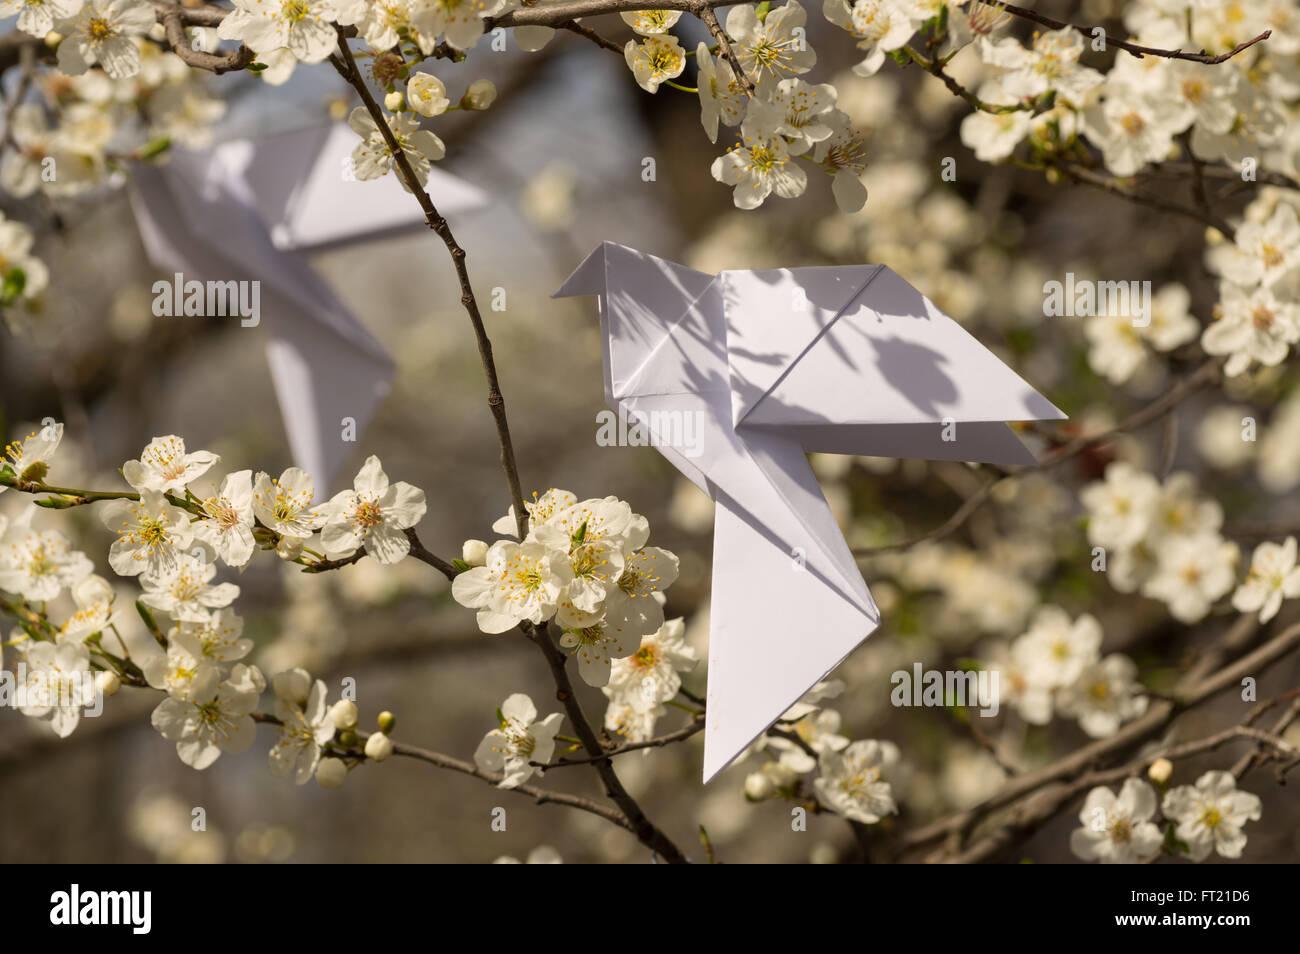 Weiße Origami Taube Vögel hängen blühender Frühling Pflaumenbaum Stockbild